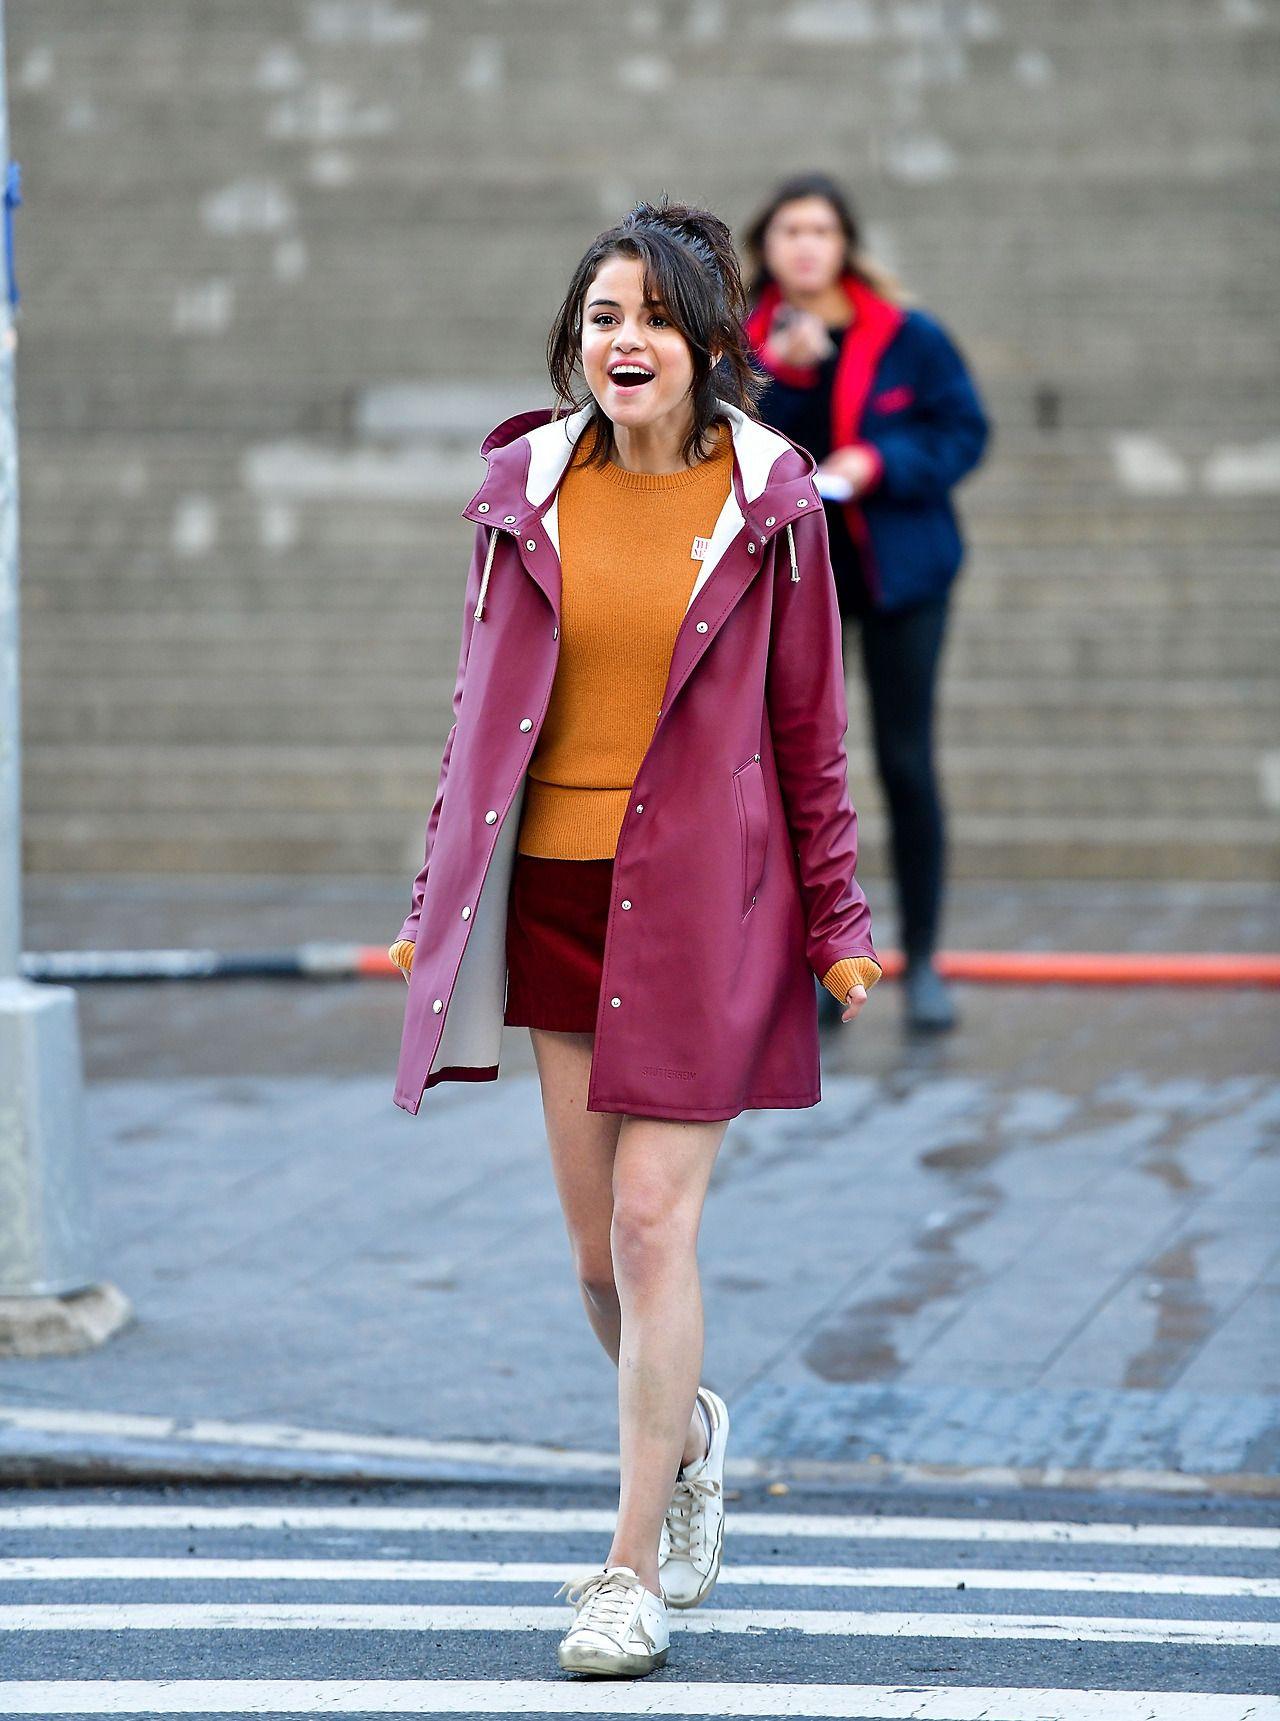 October 4 Selena on set of a movie film in New York, NY